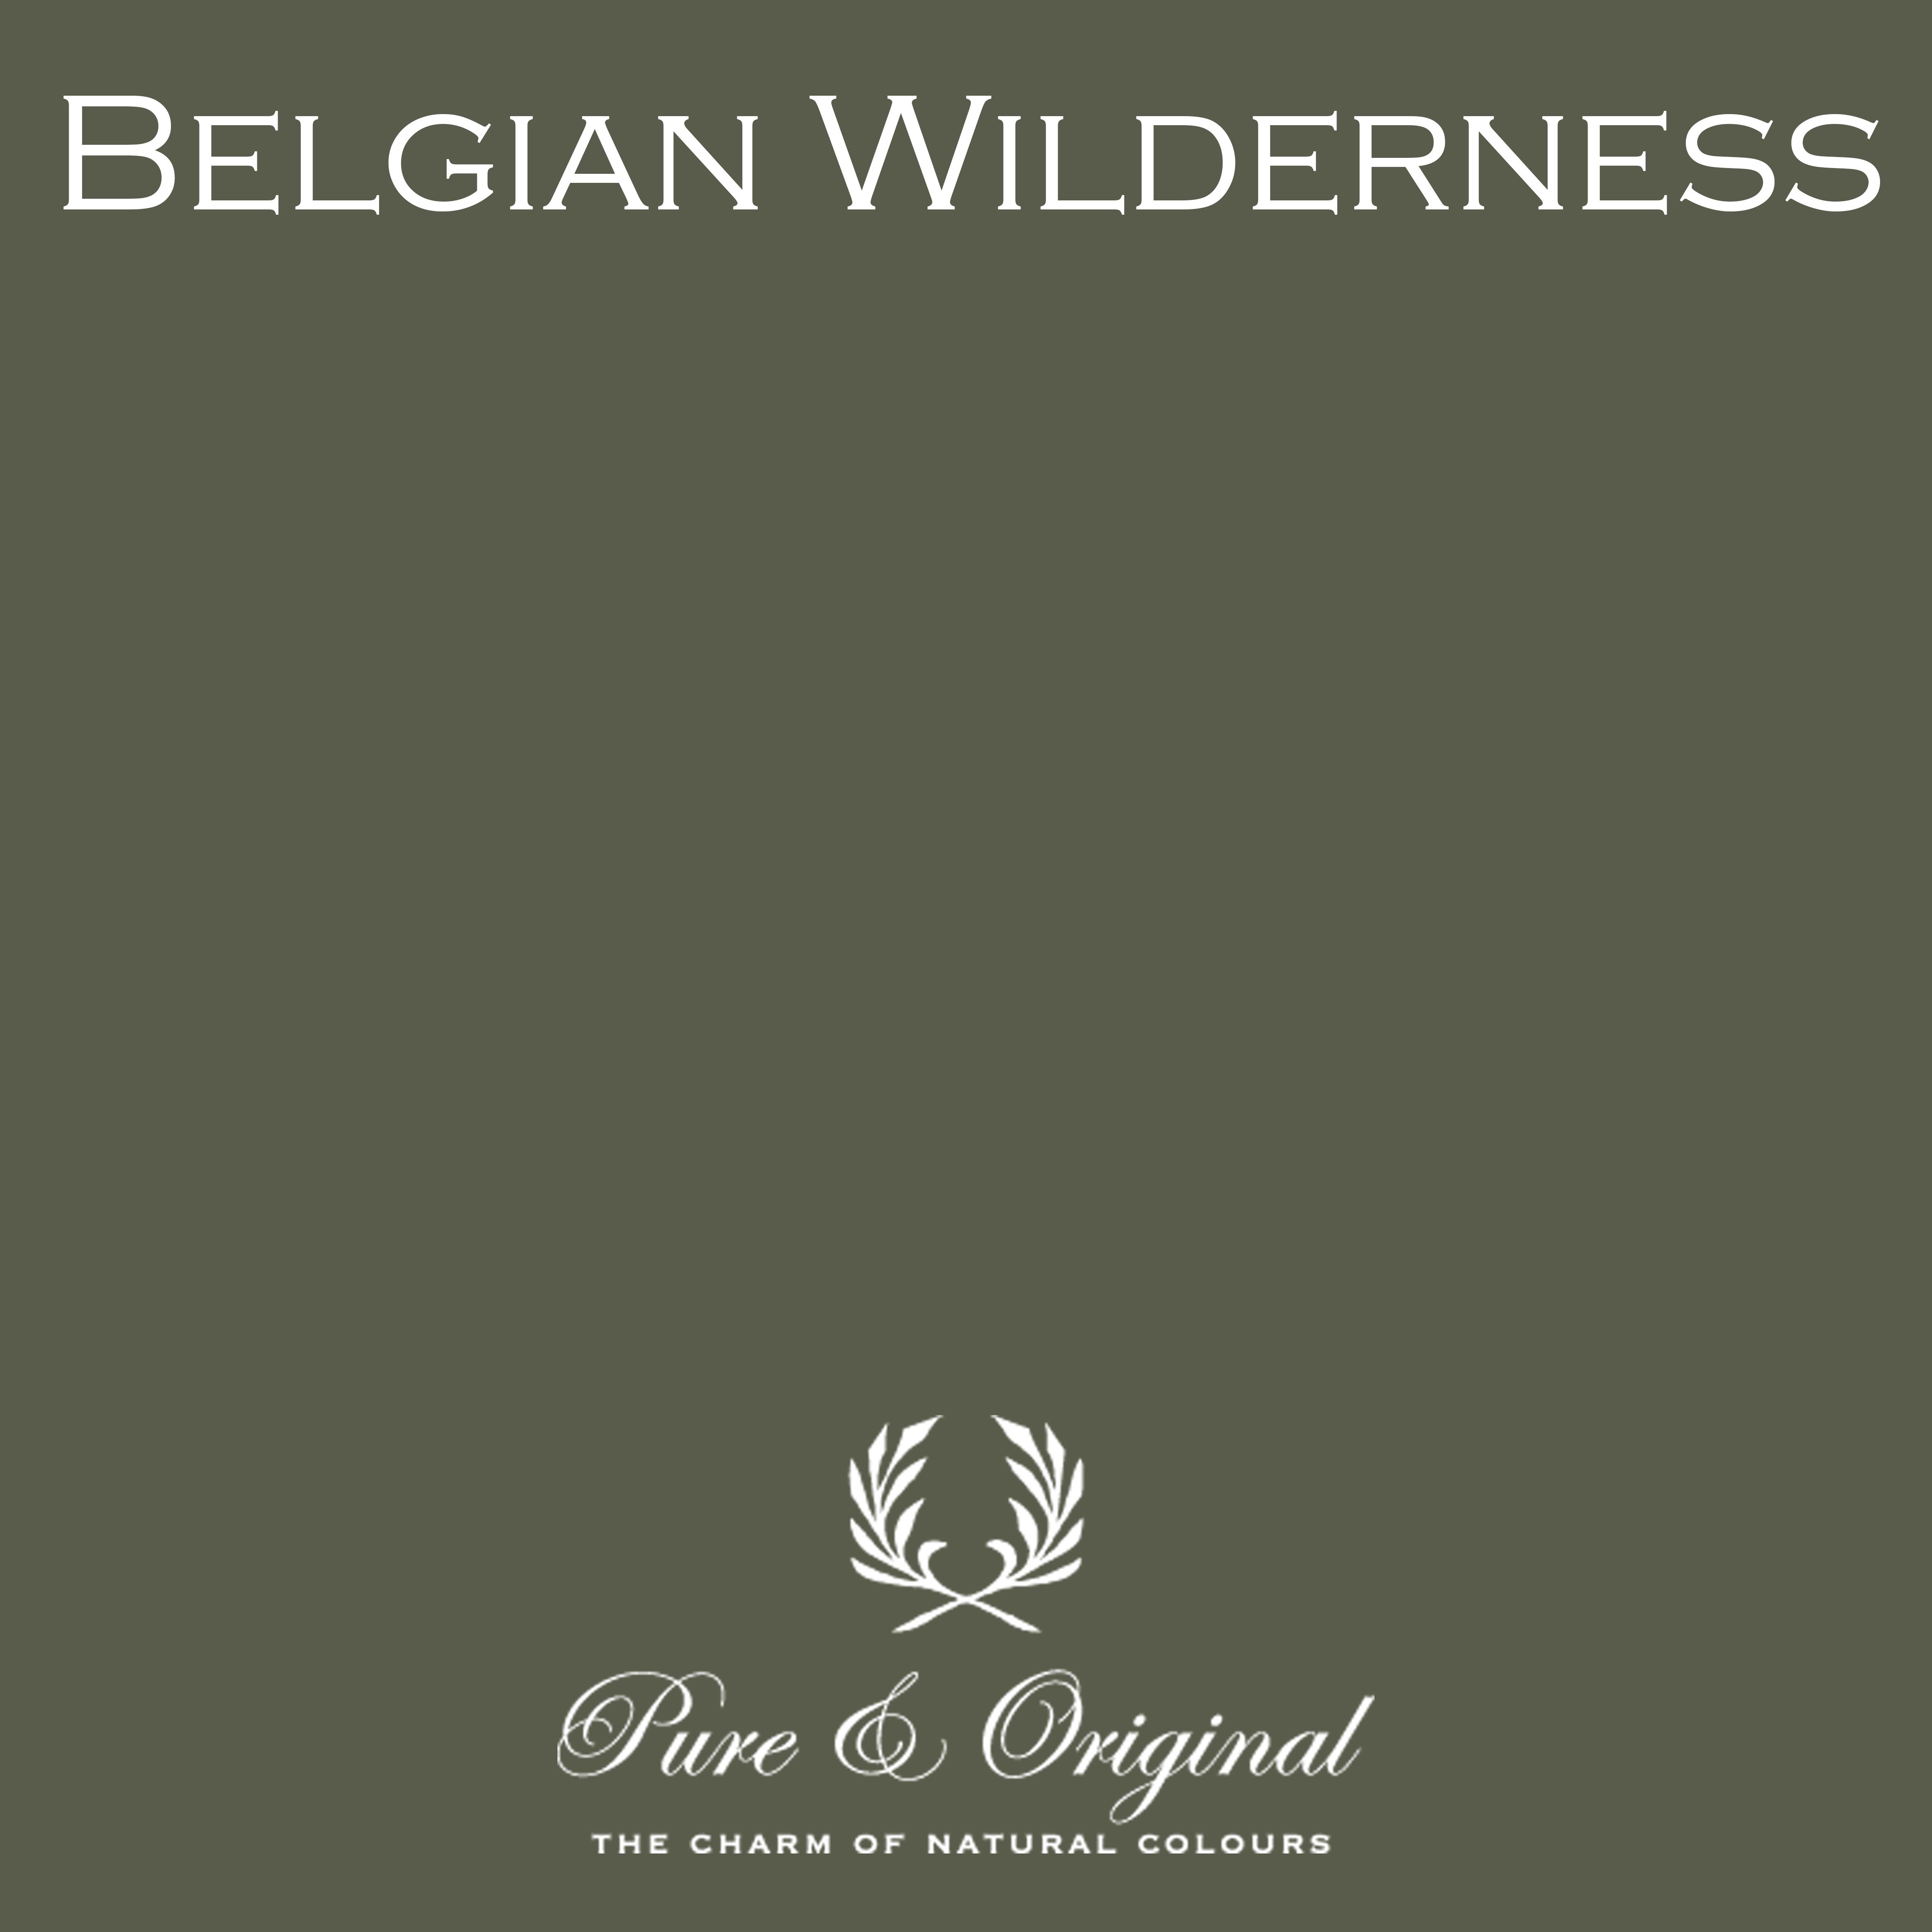 Kulör Belgian Wilderness, Classico kritfärg